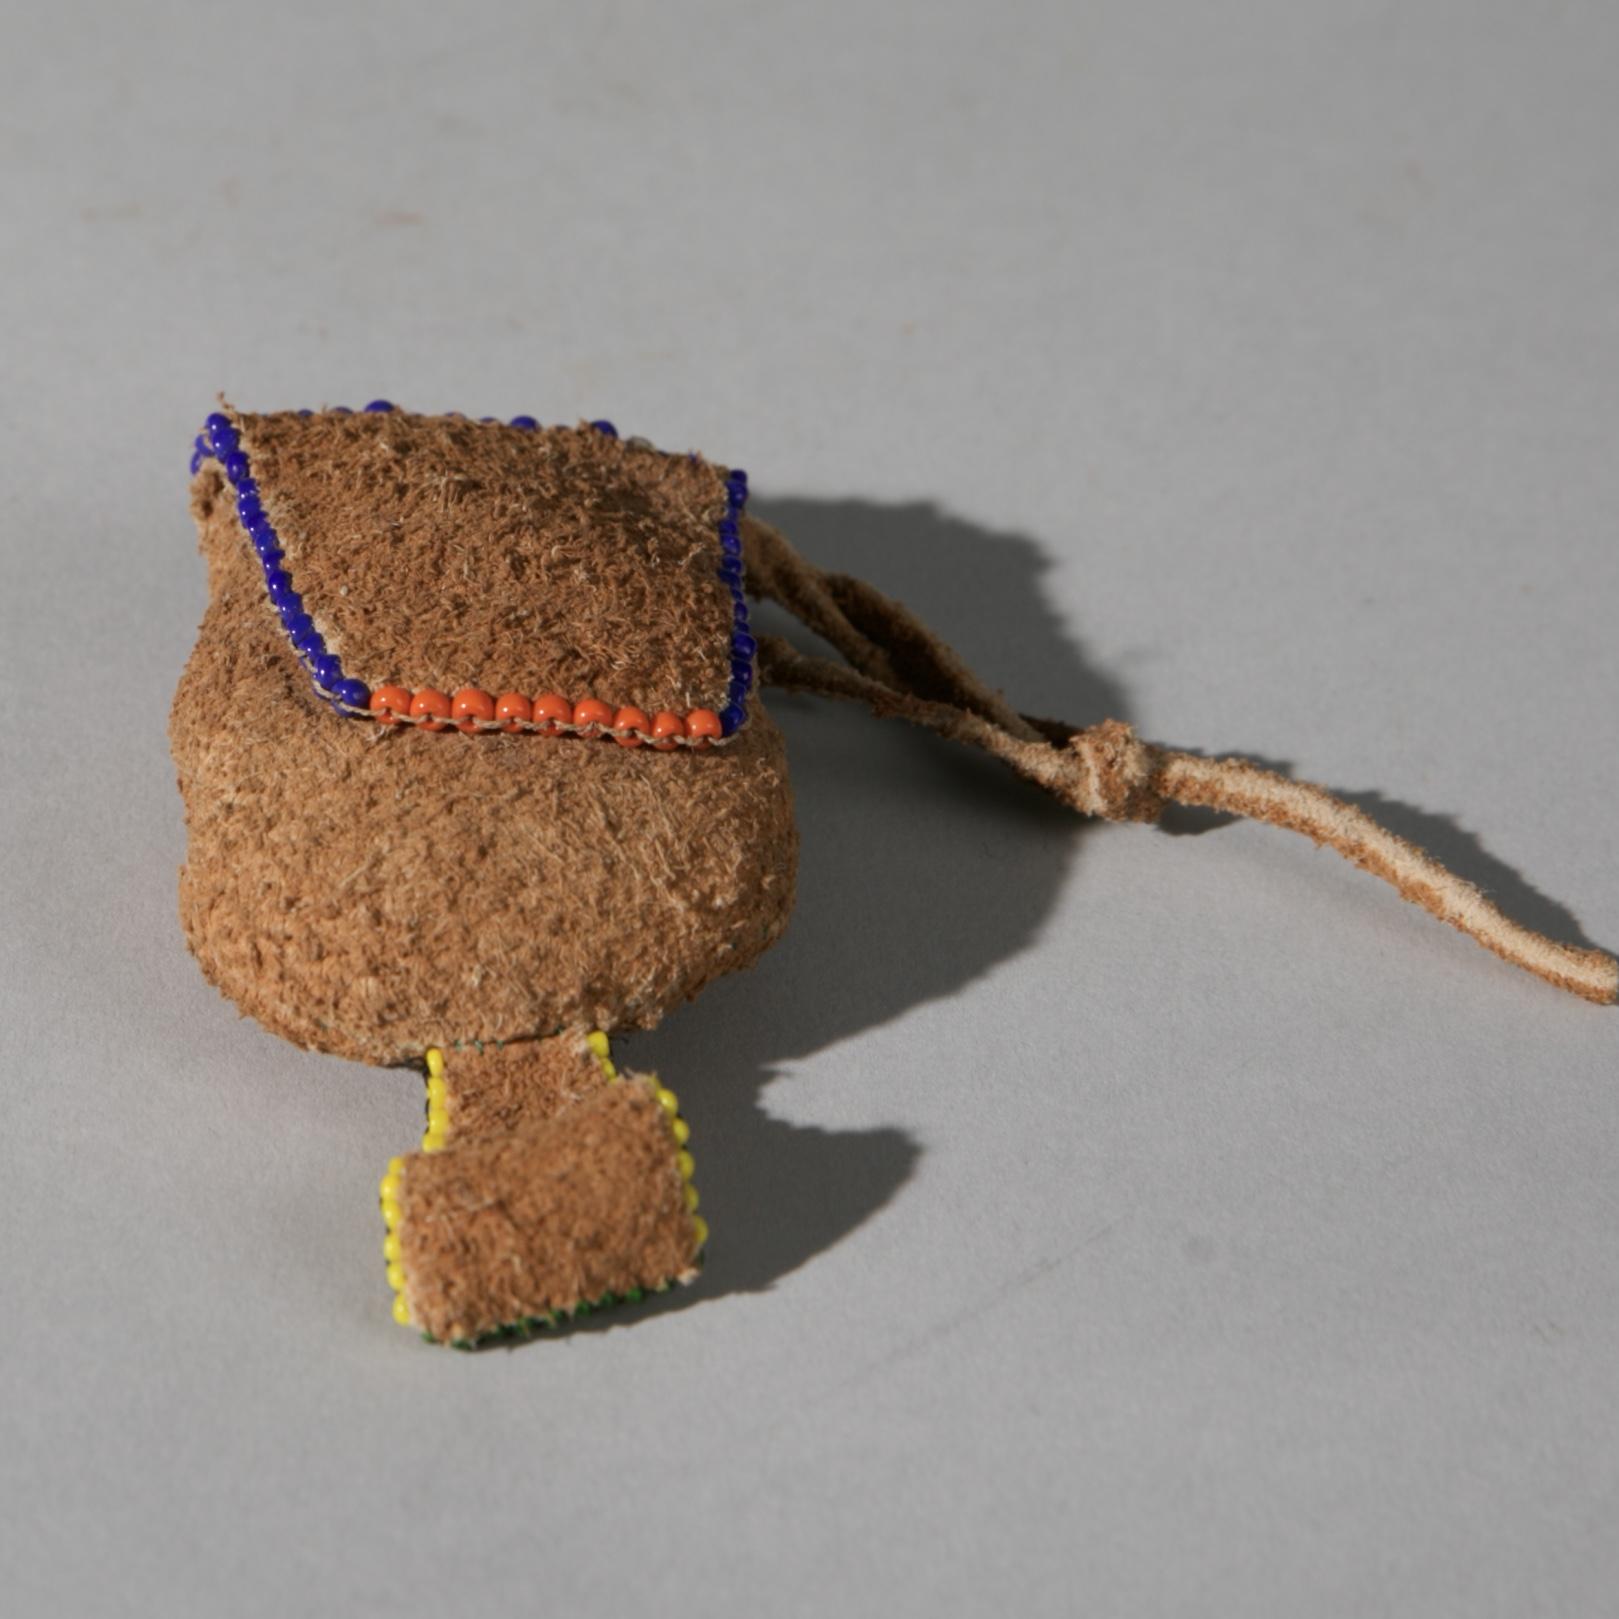 SAN 'BUSHMEN' BEADED LEATHER PERFUME HERB POUCH, NAMIBIA, SW AFRICA  No 3931)